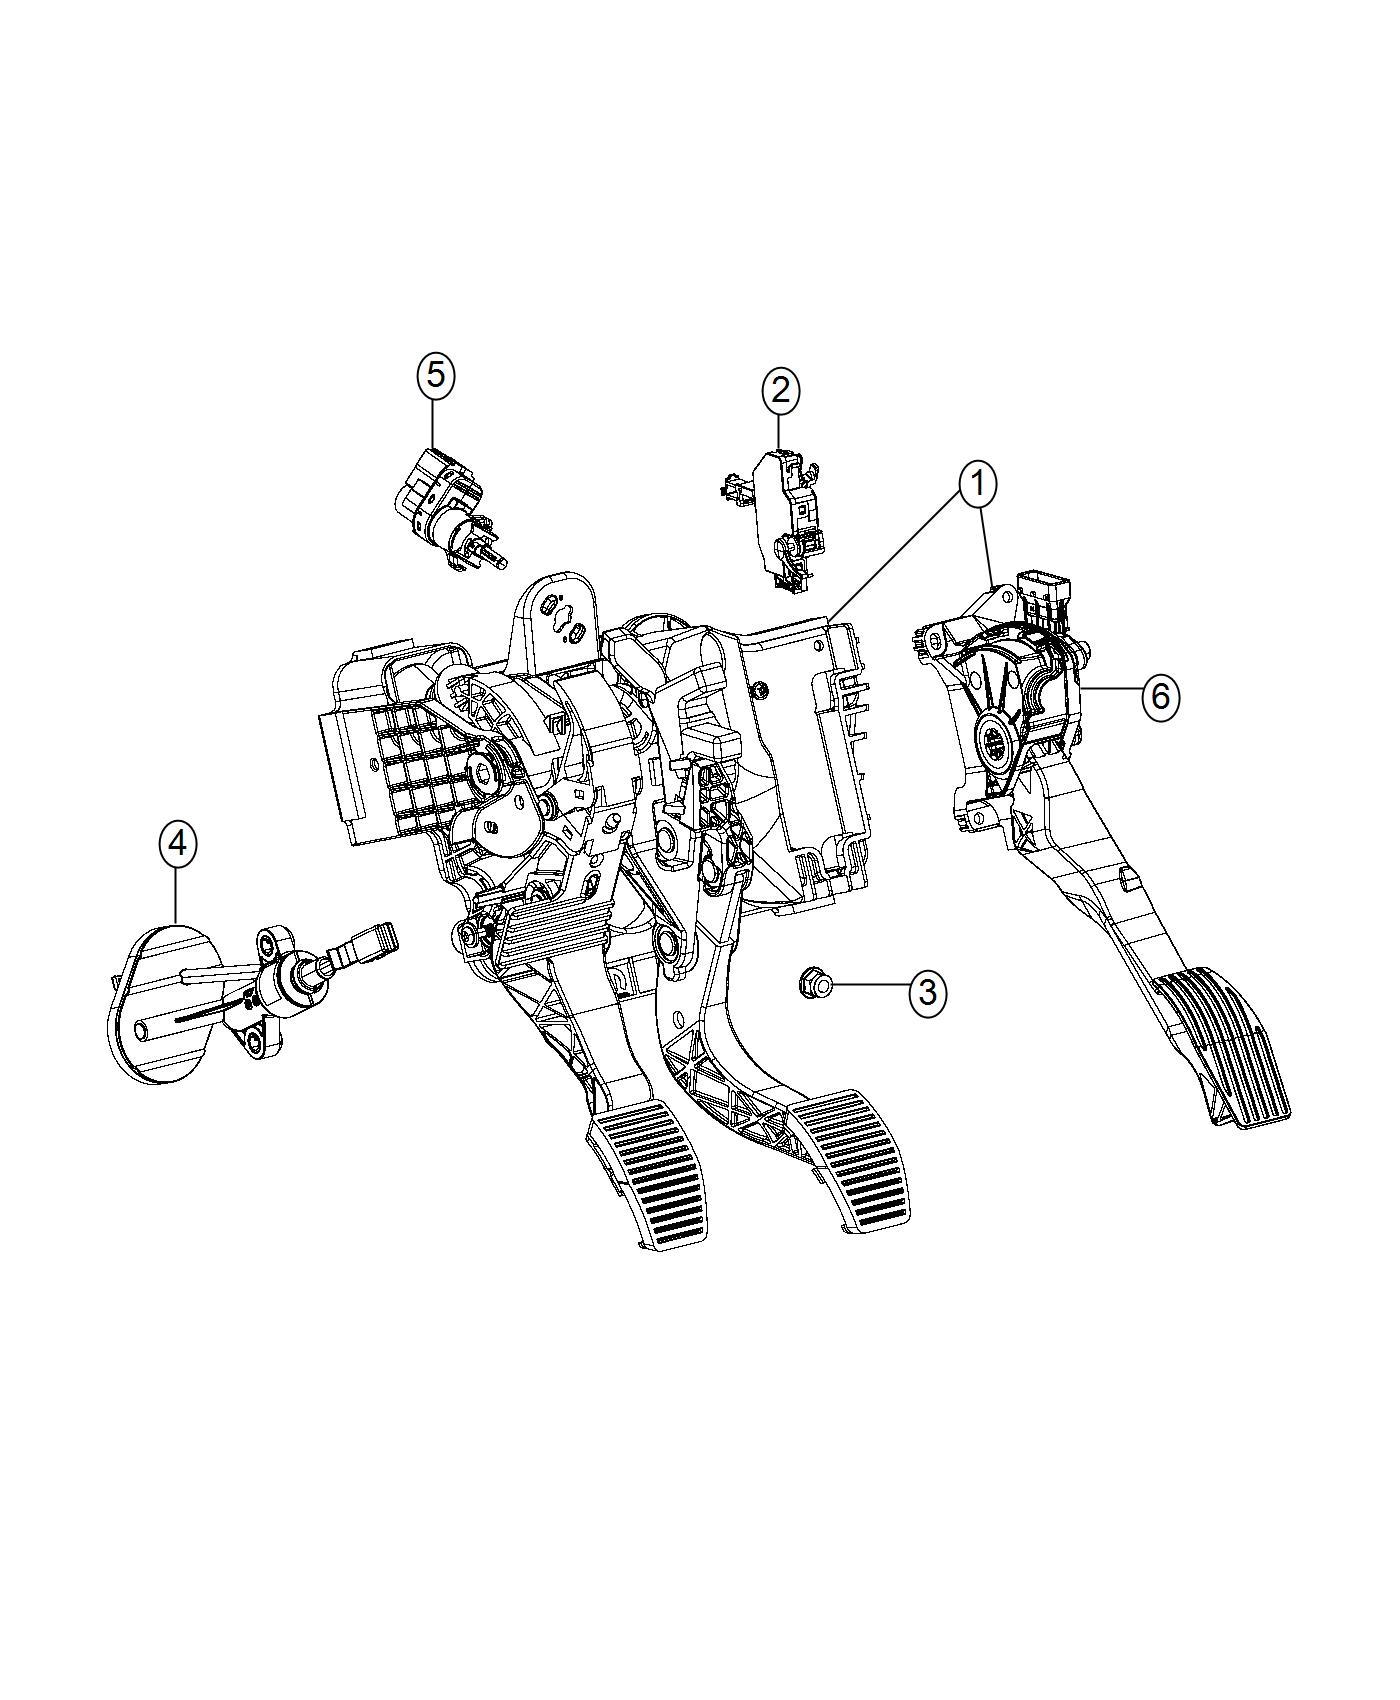 Jeep Compass Switch. Clutch starter interlock. Export, us